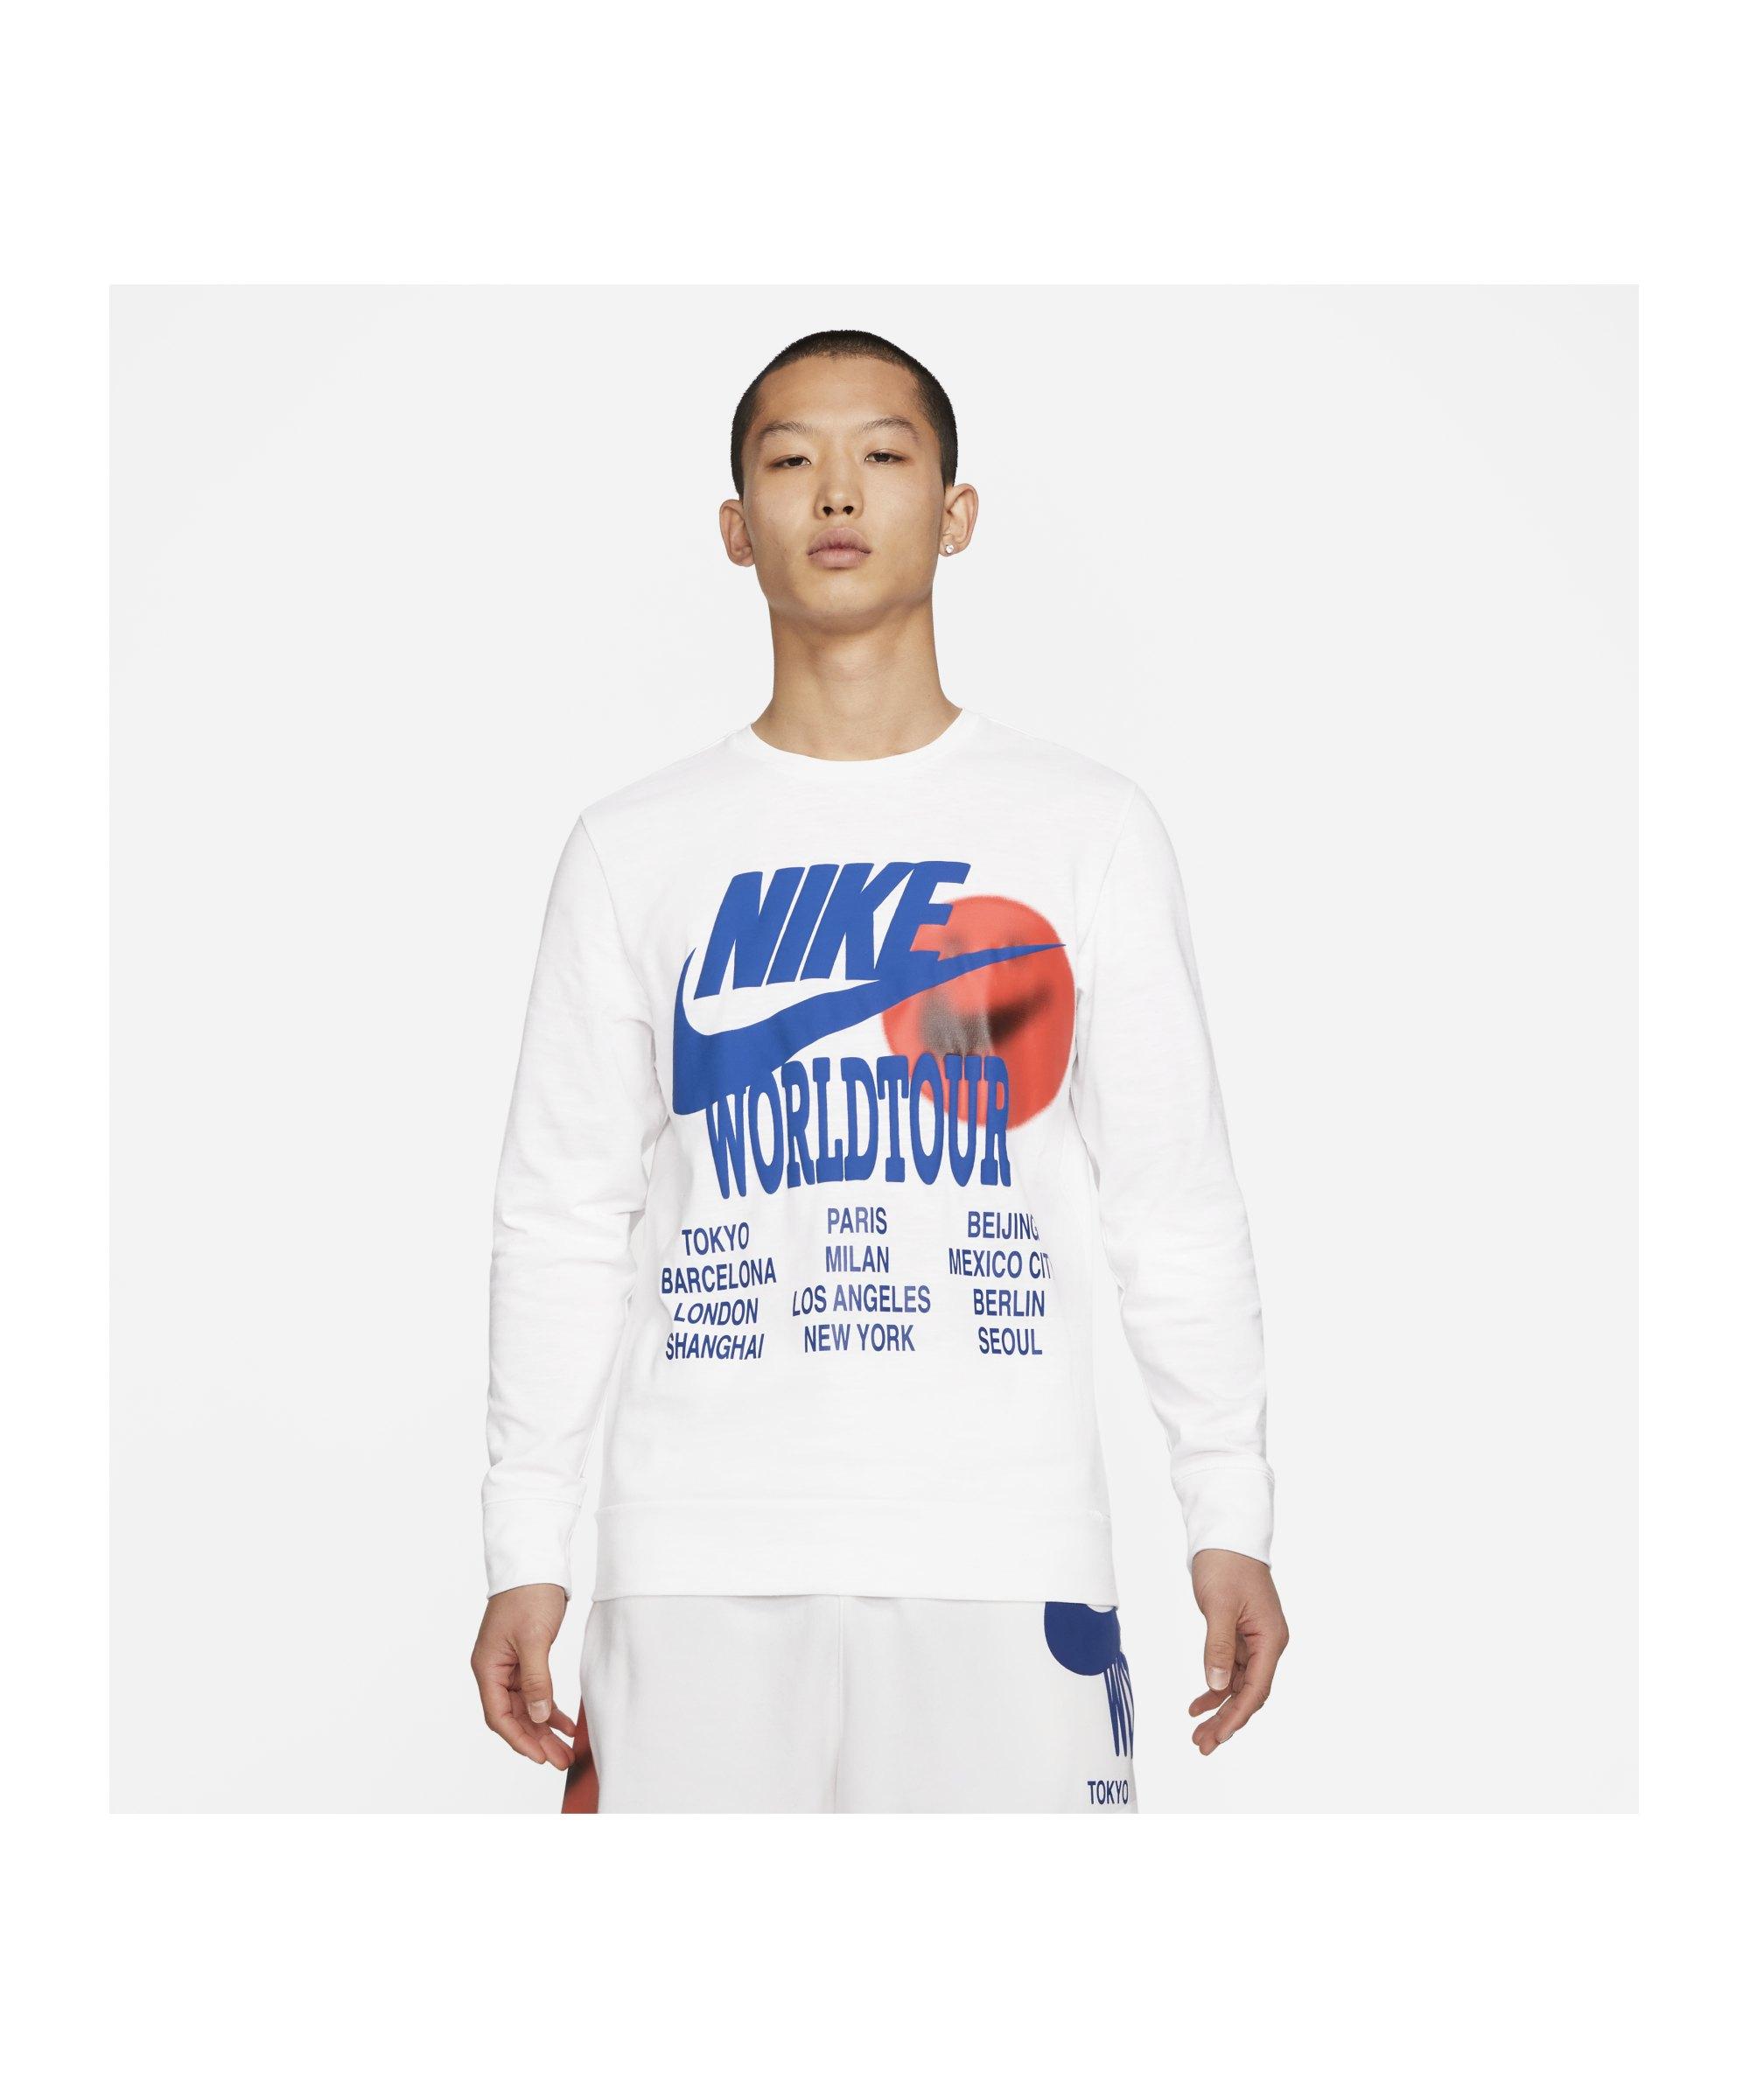 Nike World Tour Sweatshirt Weiss F100 - weiss